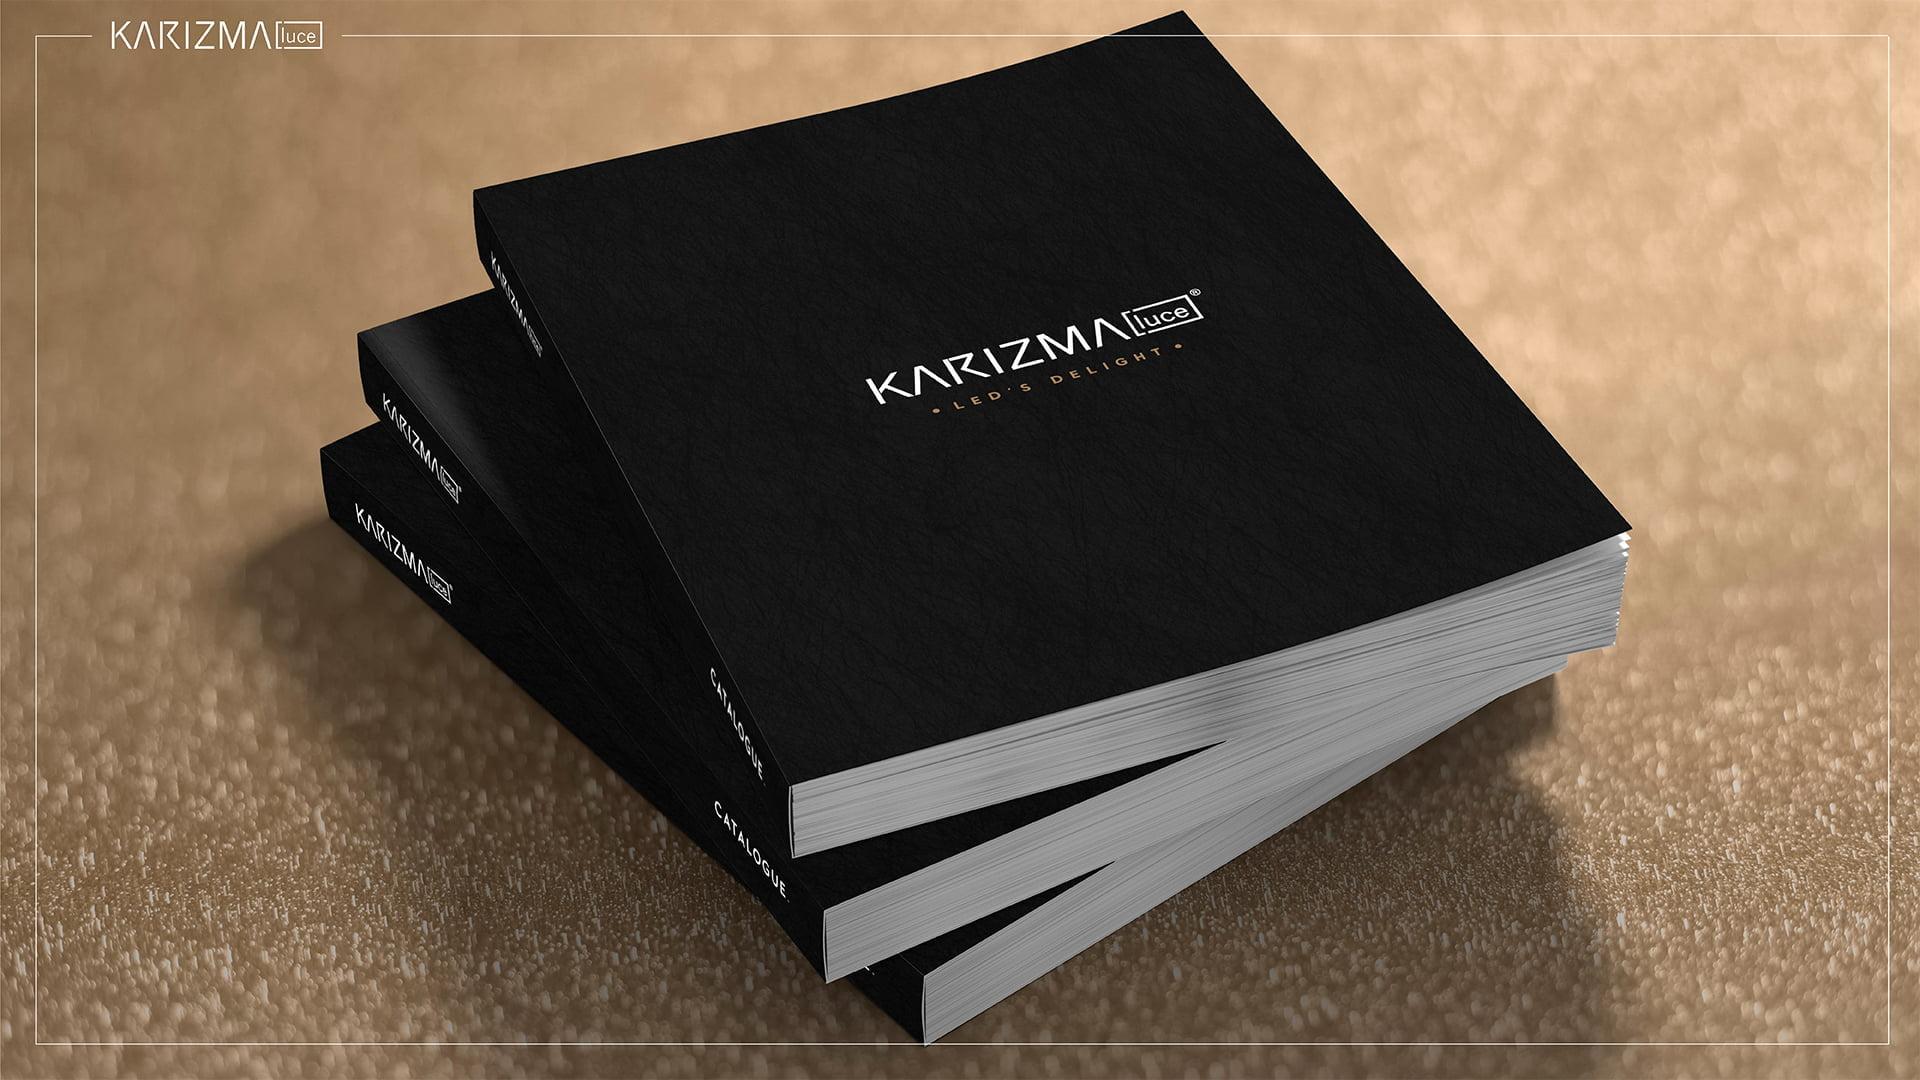 Karizma Luce catalogue